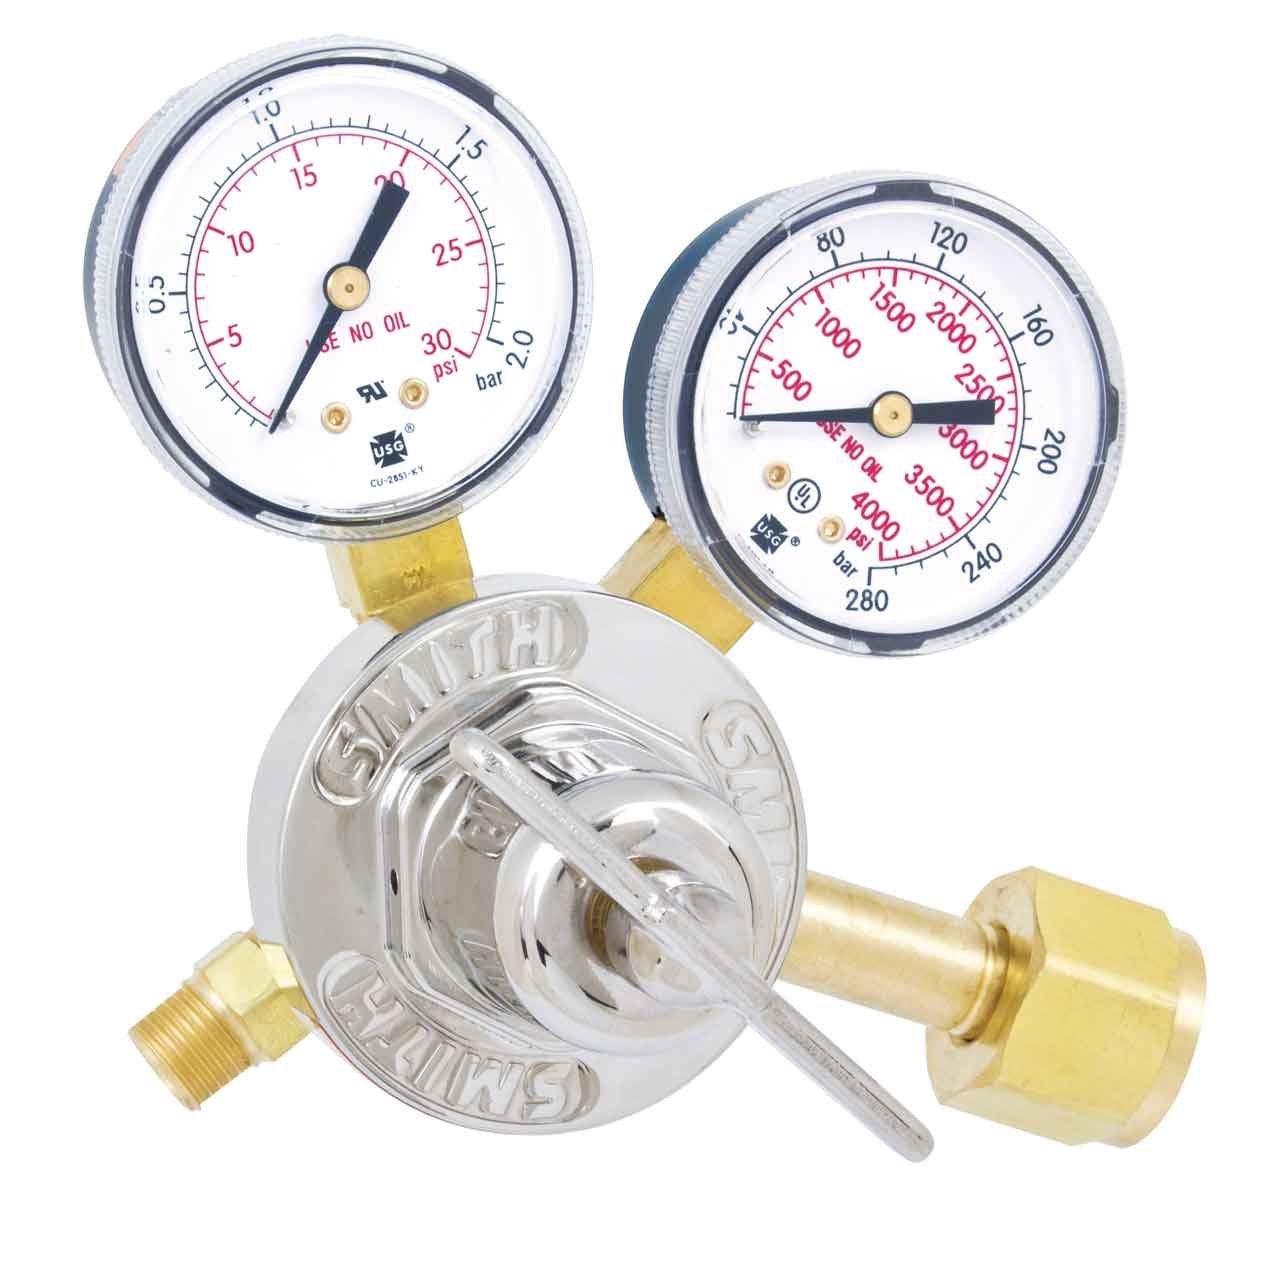 Oxygen Regulator Low Pressure for Oxy-Acetylene Welding by Miller Electric